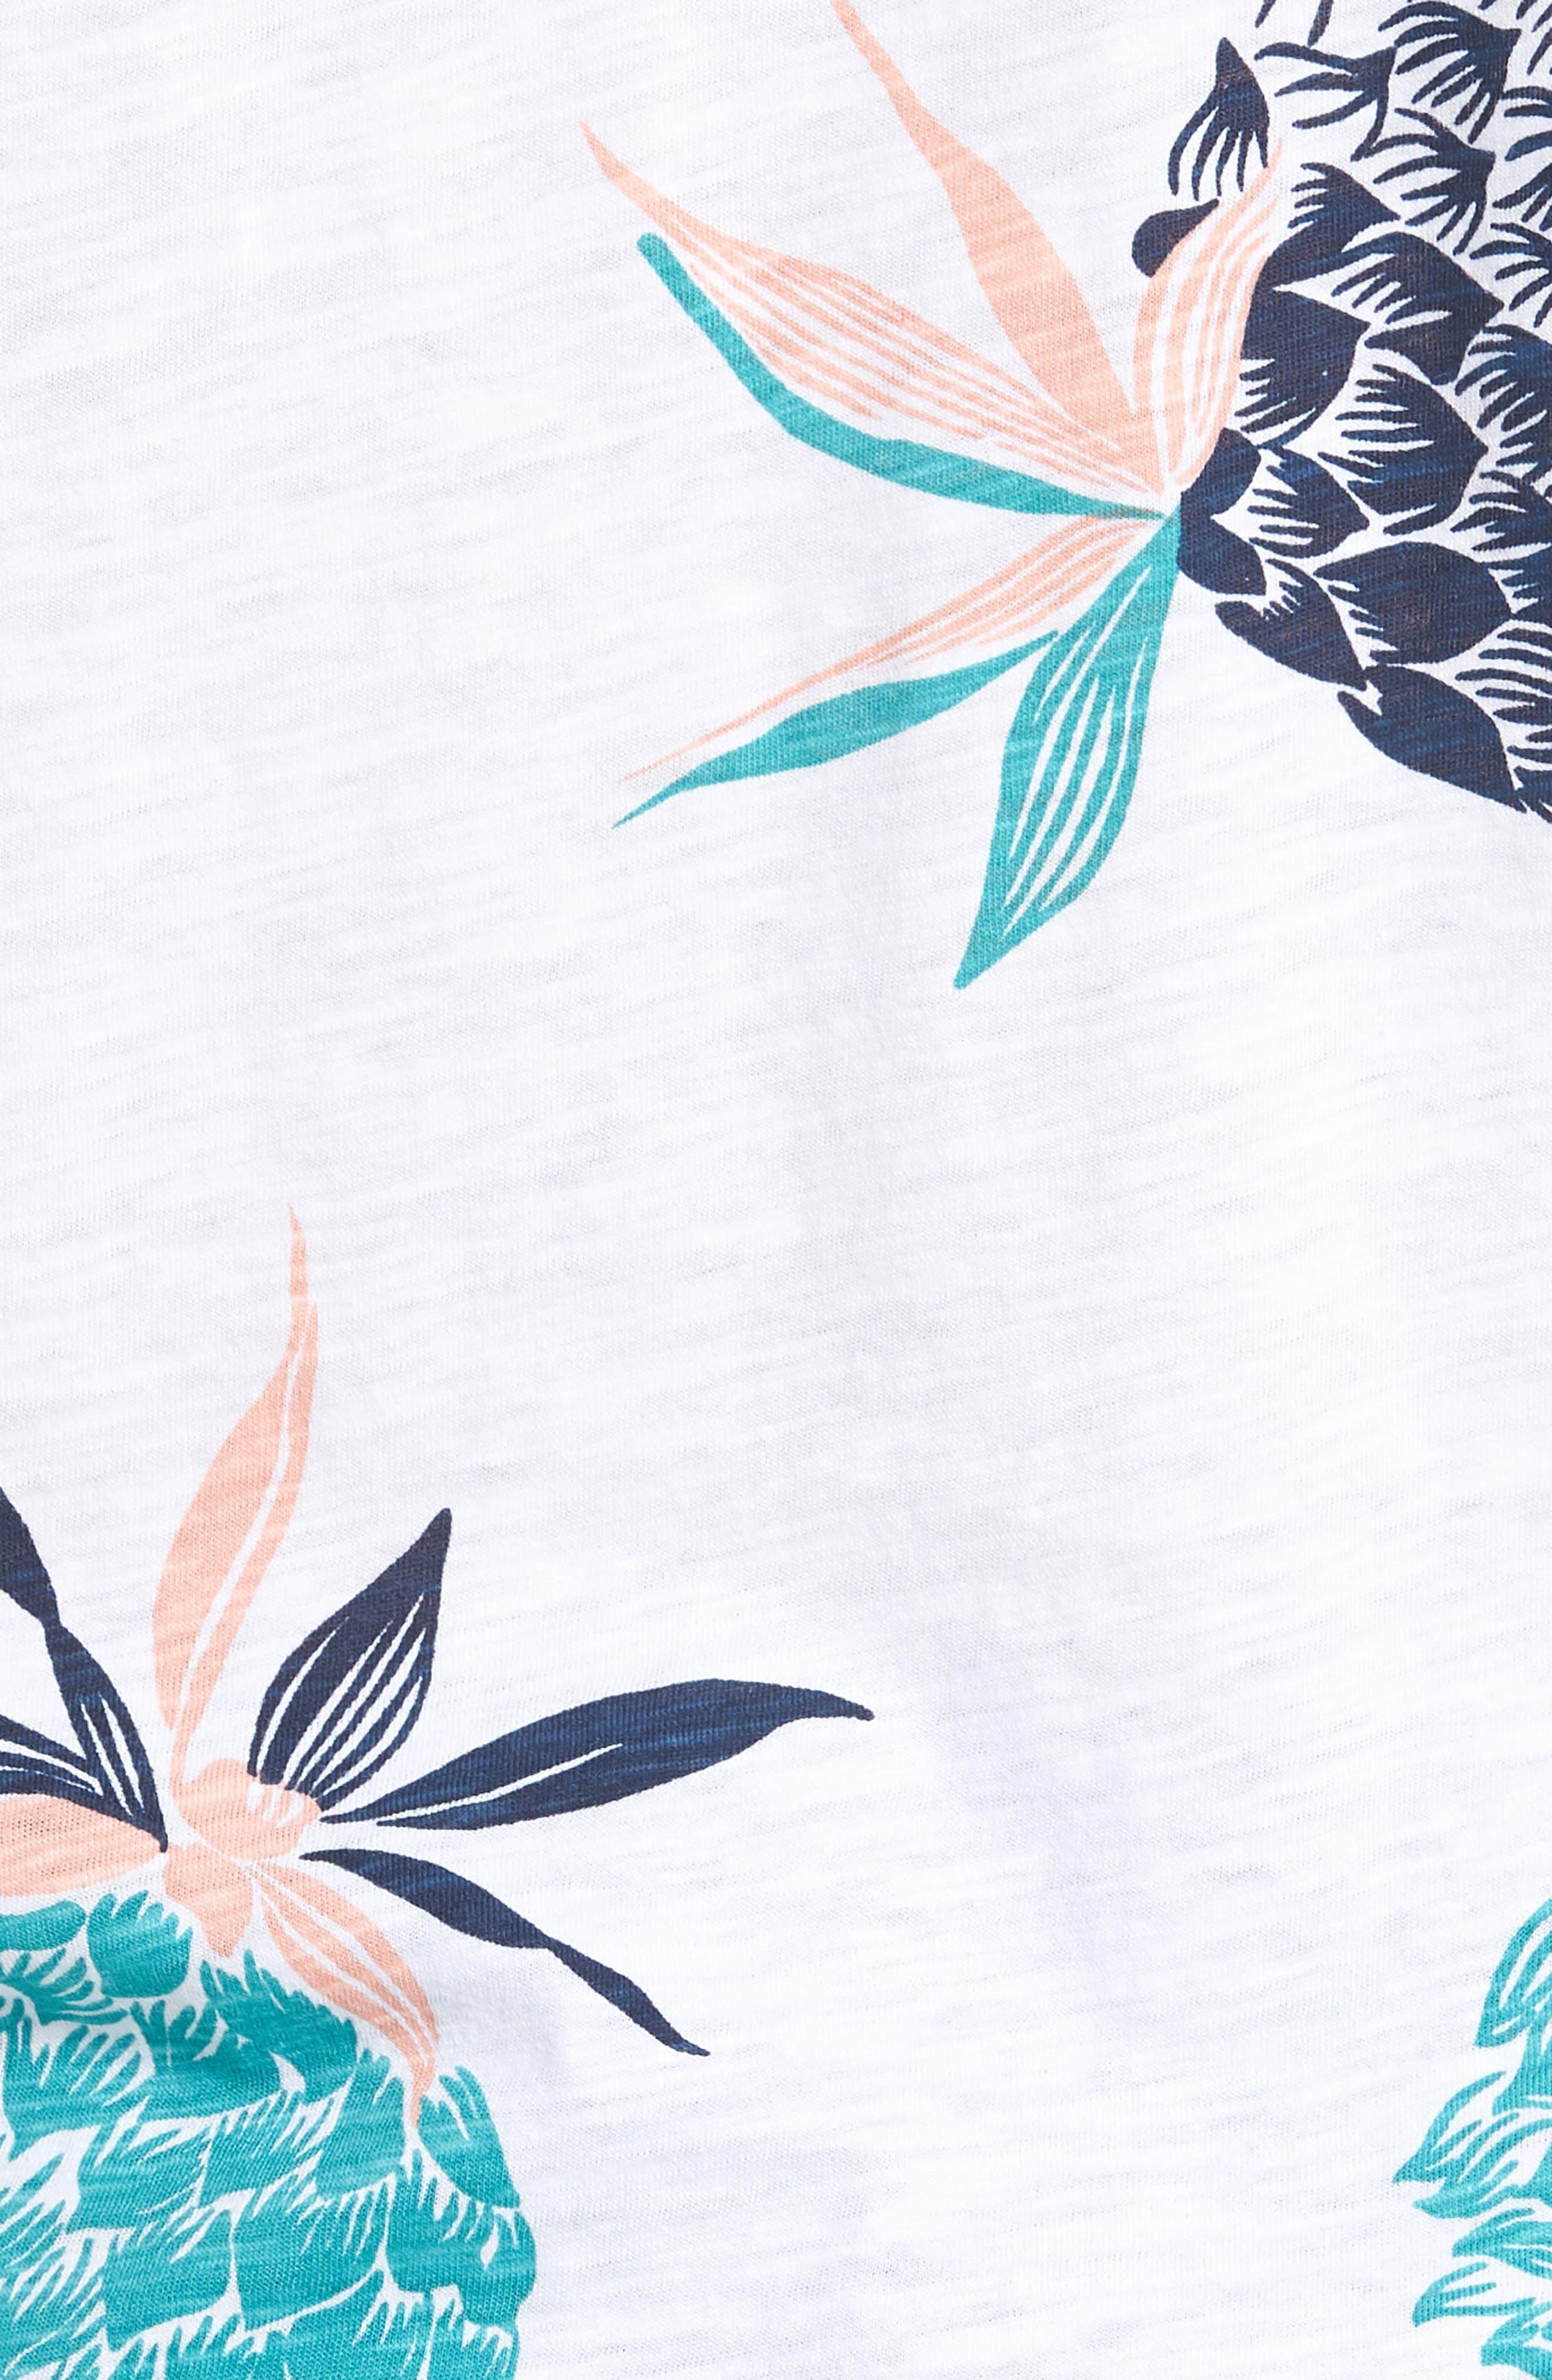 Pineapple Party Slim Fit T-Shirt,                             Alternate thumbnail 5, color,                             White/ Latigo Bay/ Sorbet